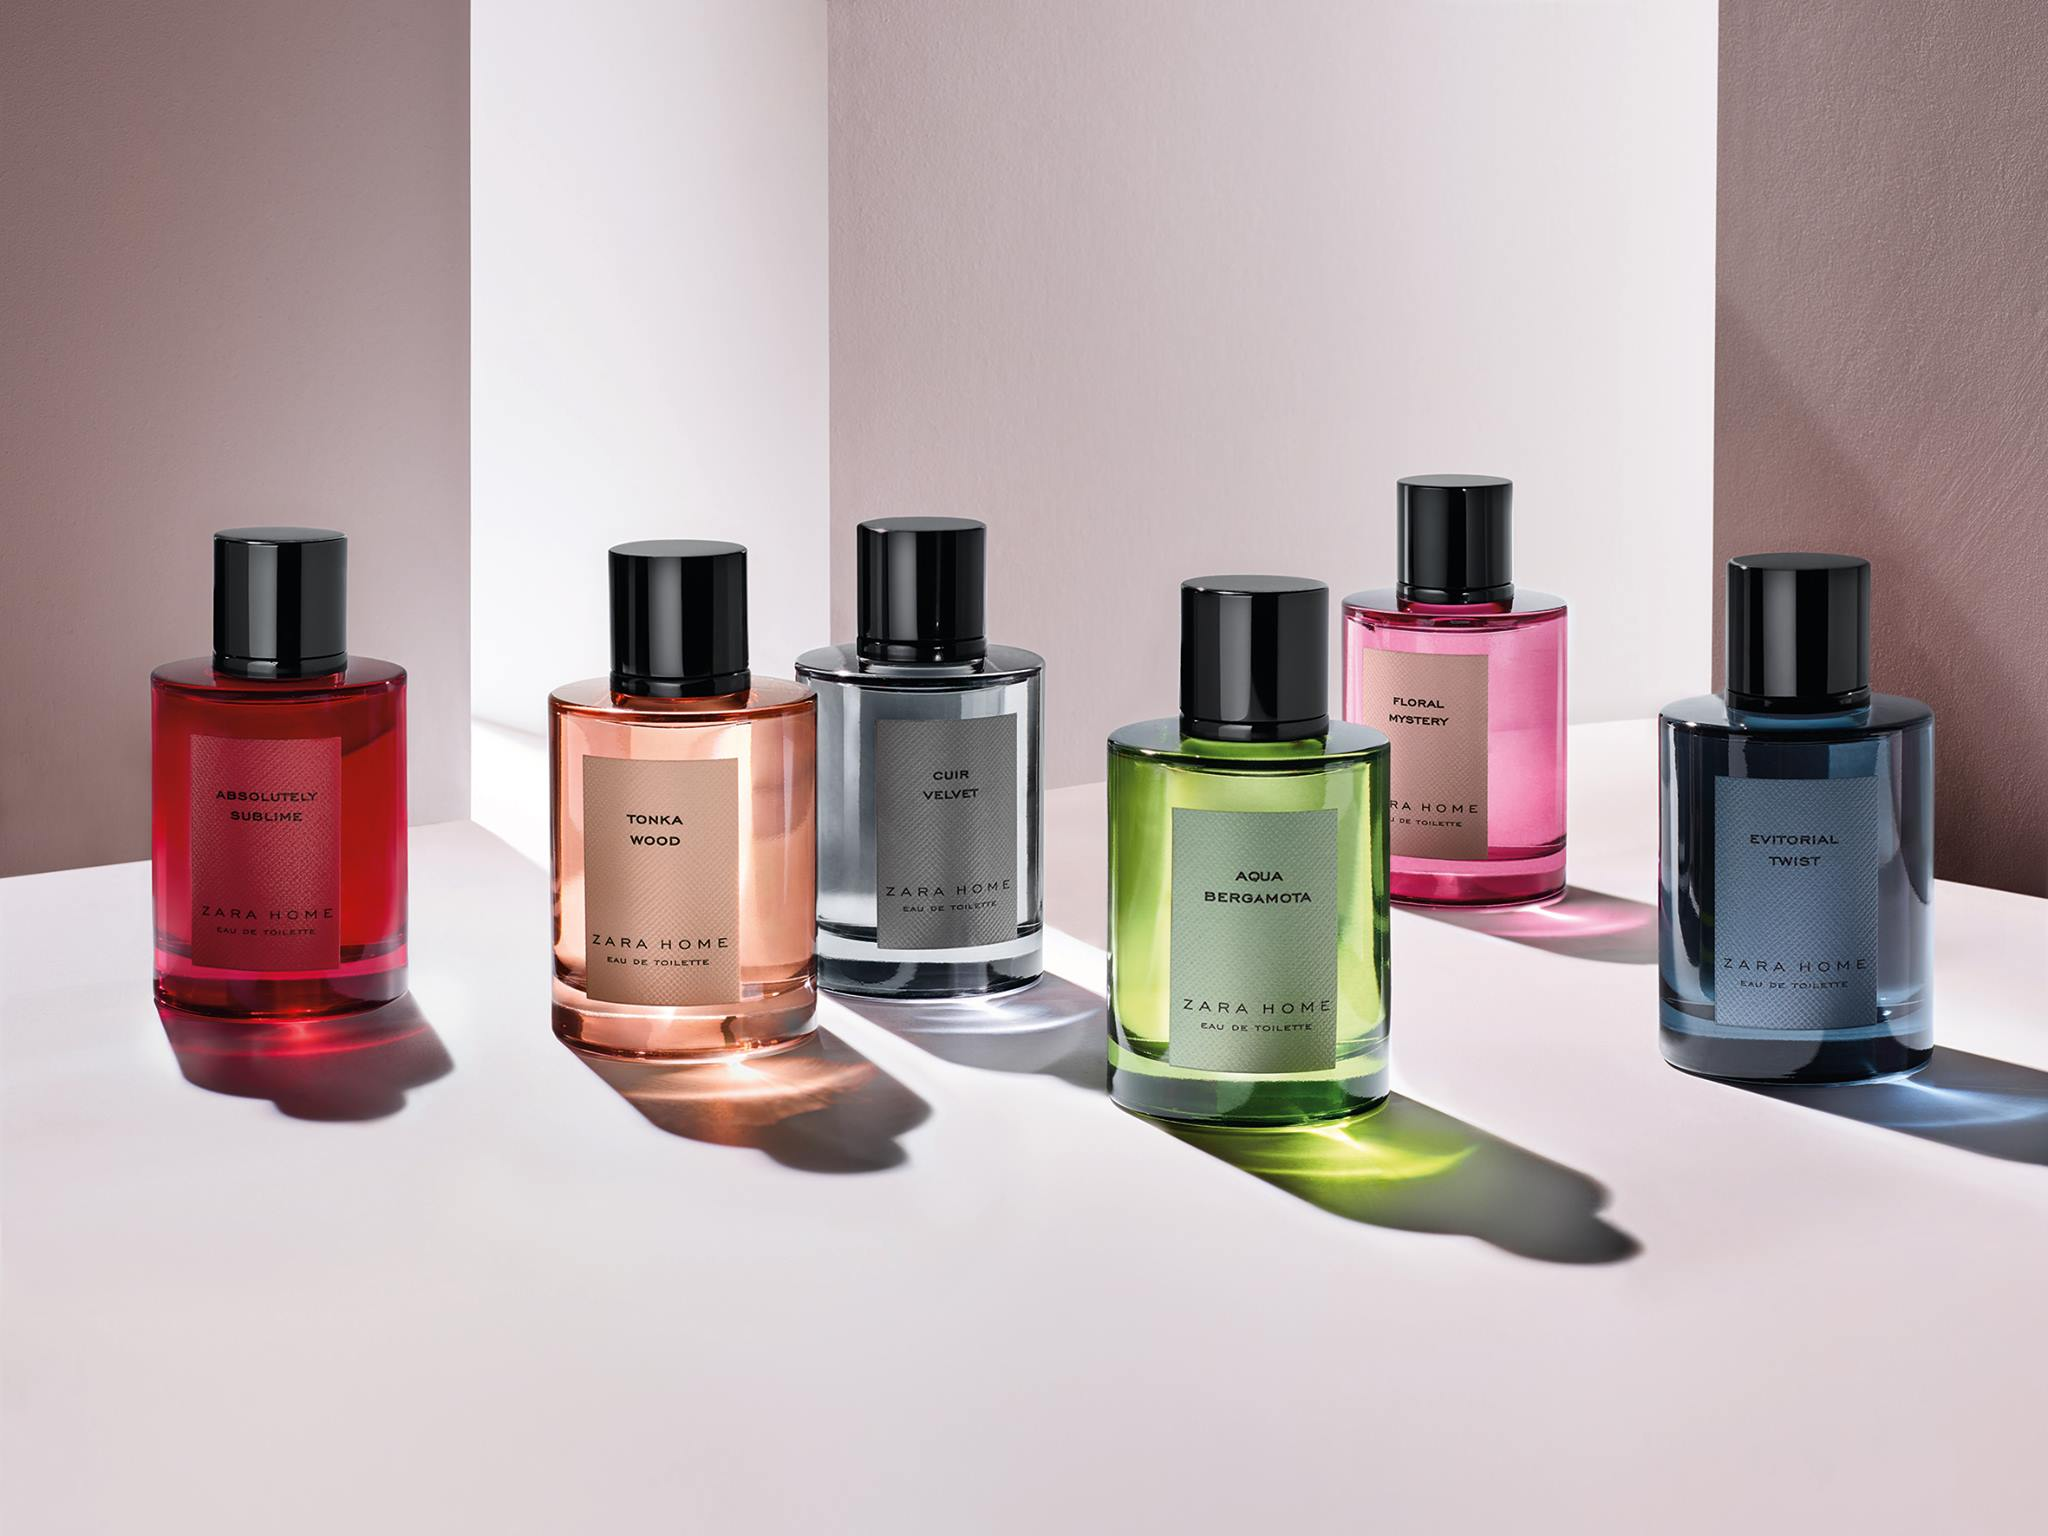 Tonka Wood Zara Home perfume - a new fragrance for women and men 2016